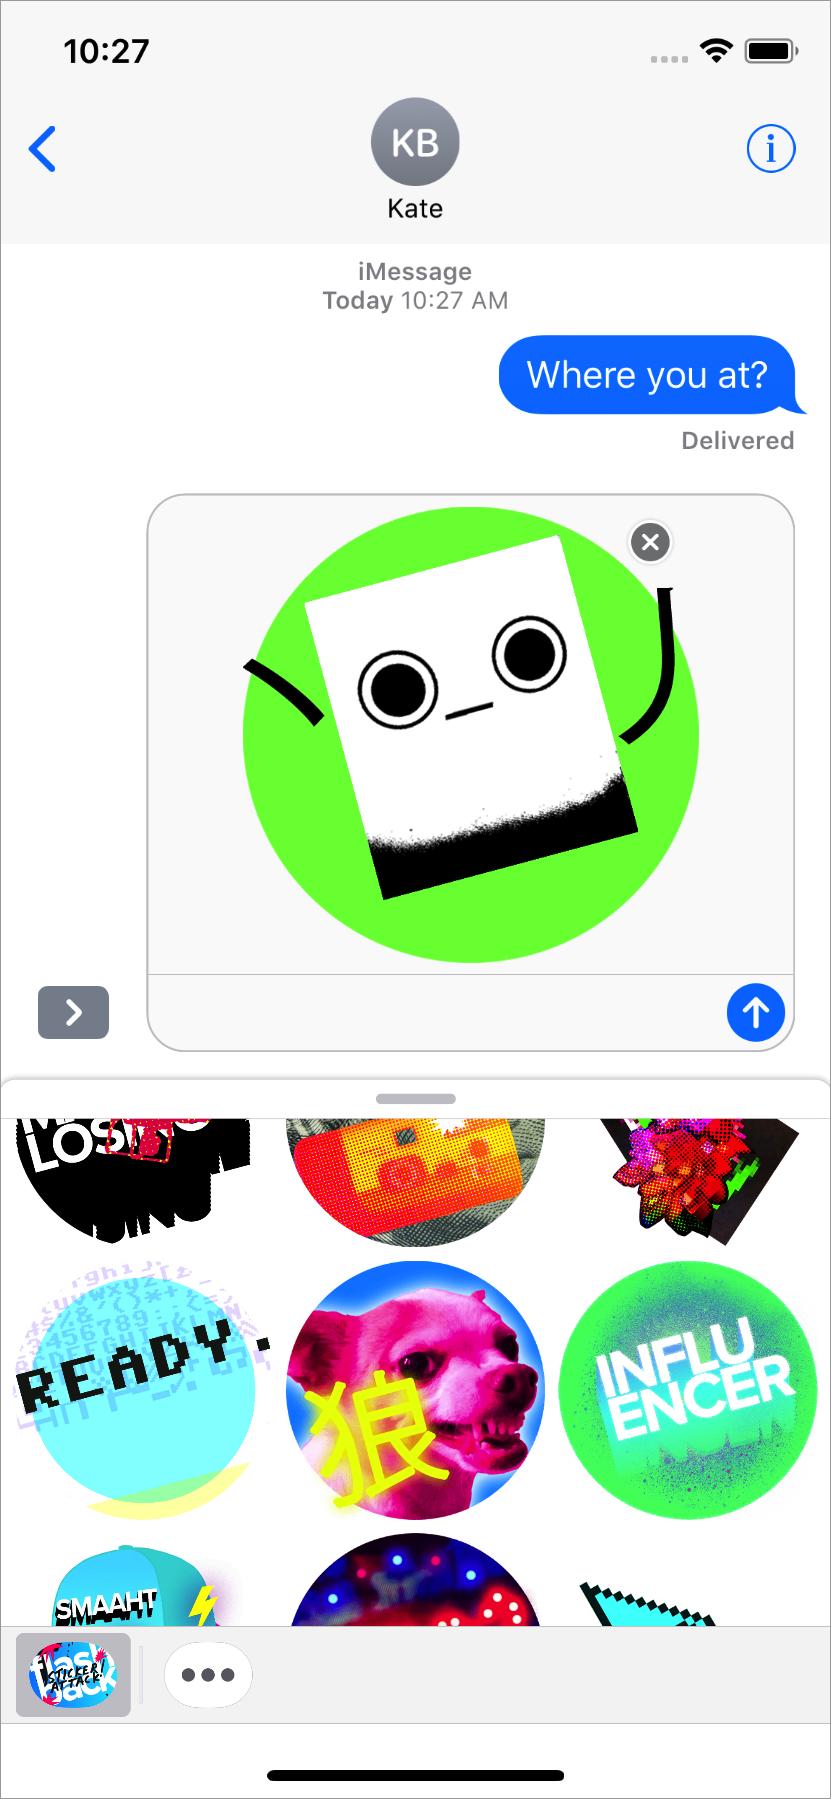 Flashback-Sticker-Attack-iMessage-02.png